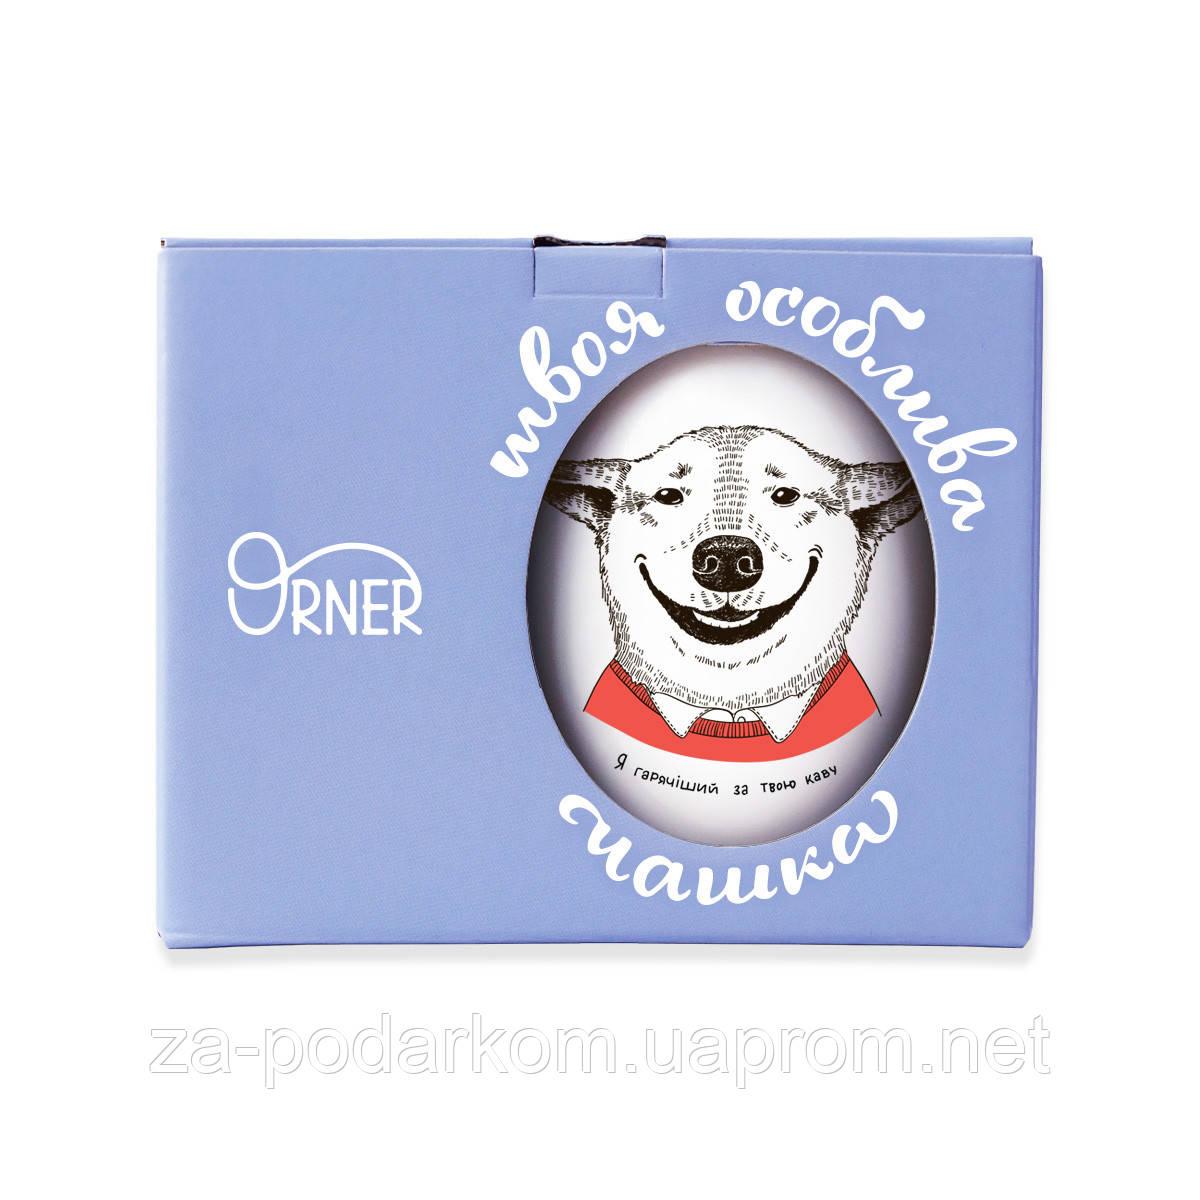 Кружка Собака-улыбака подарок подруге